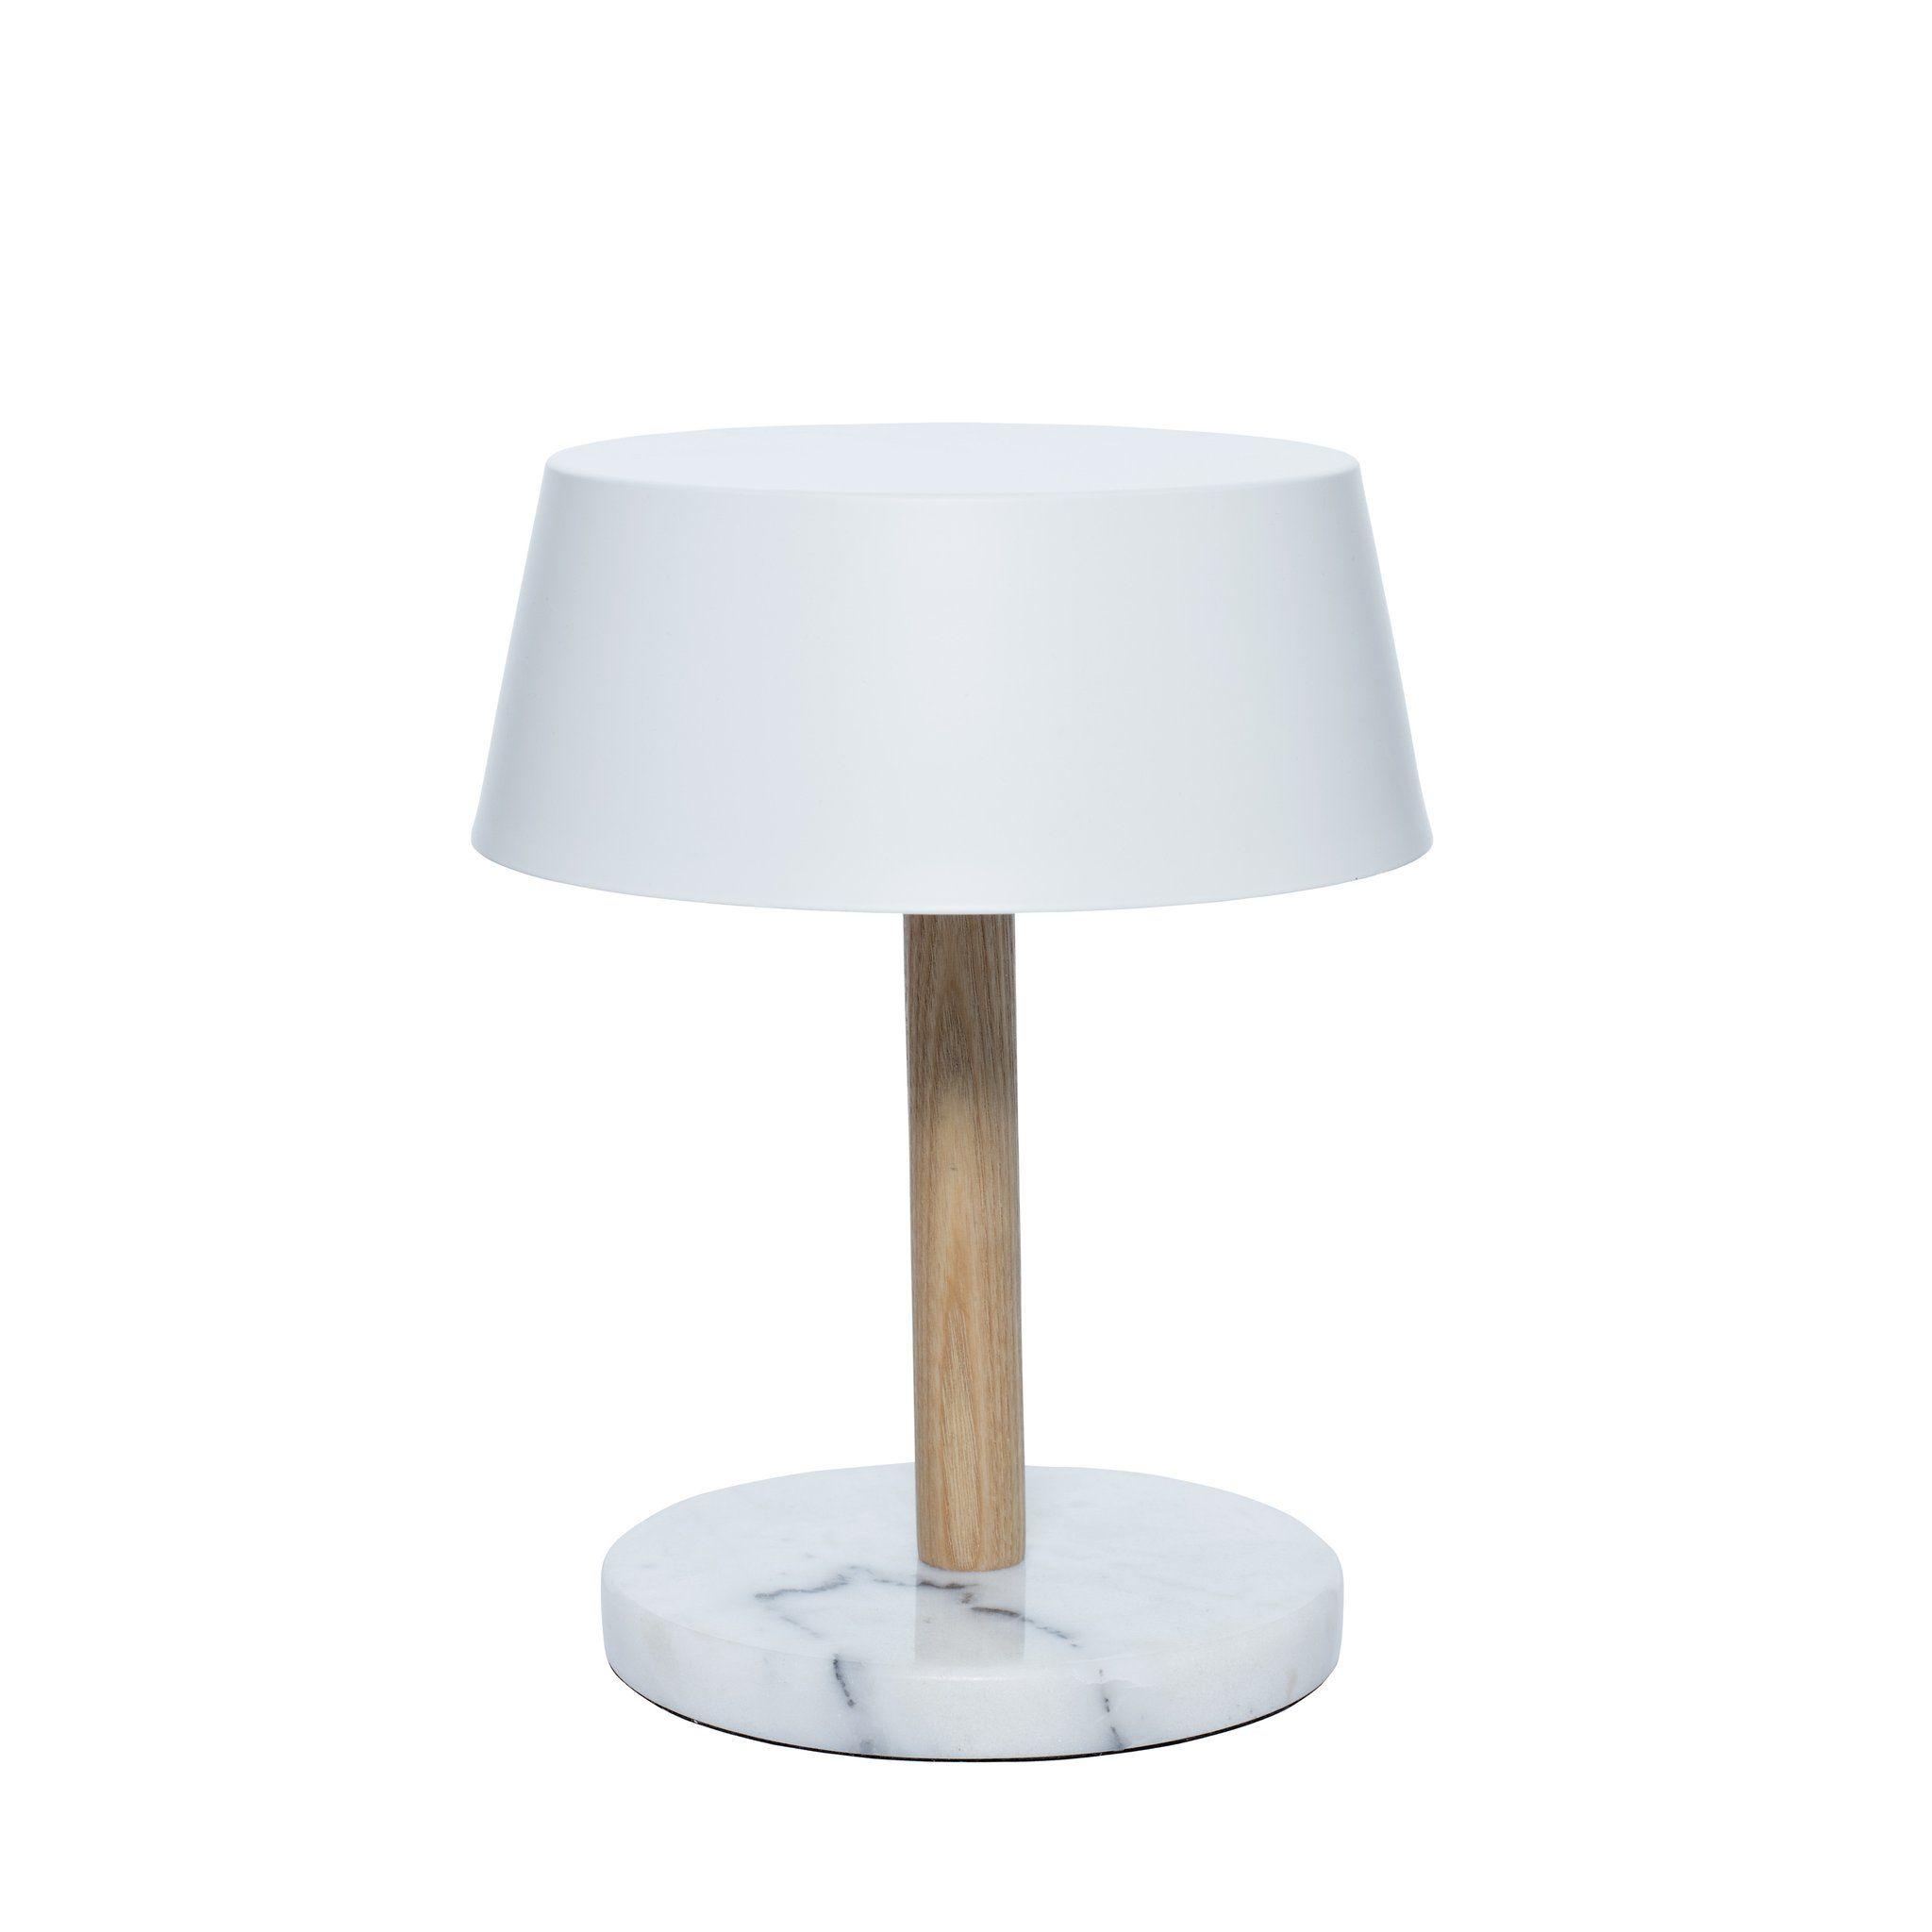 Eddie Table Lamp White White Table Lamp Lamp Table Lamp